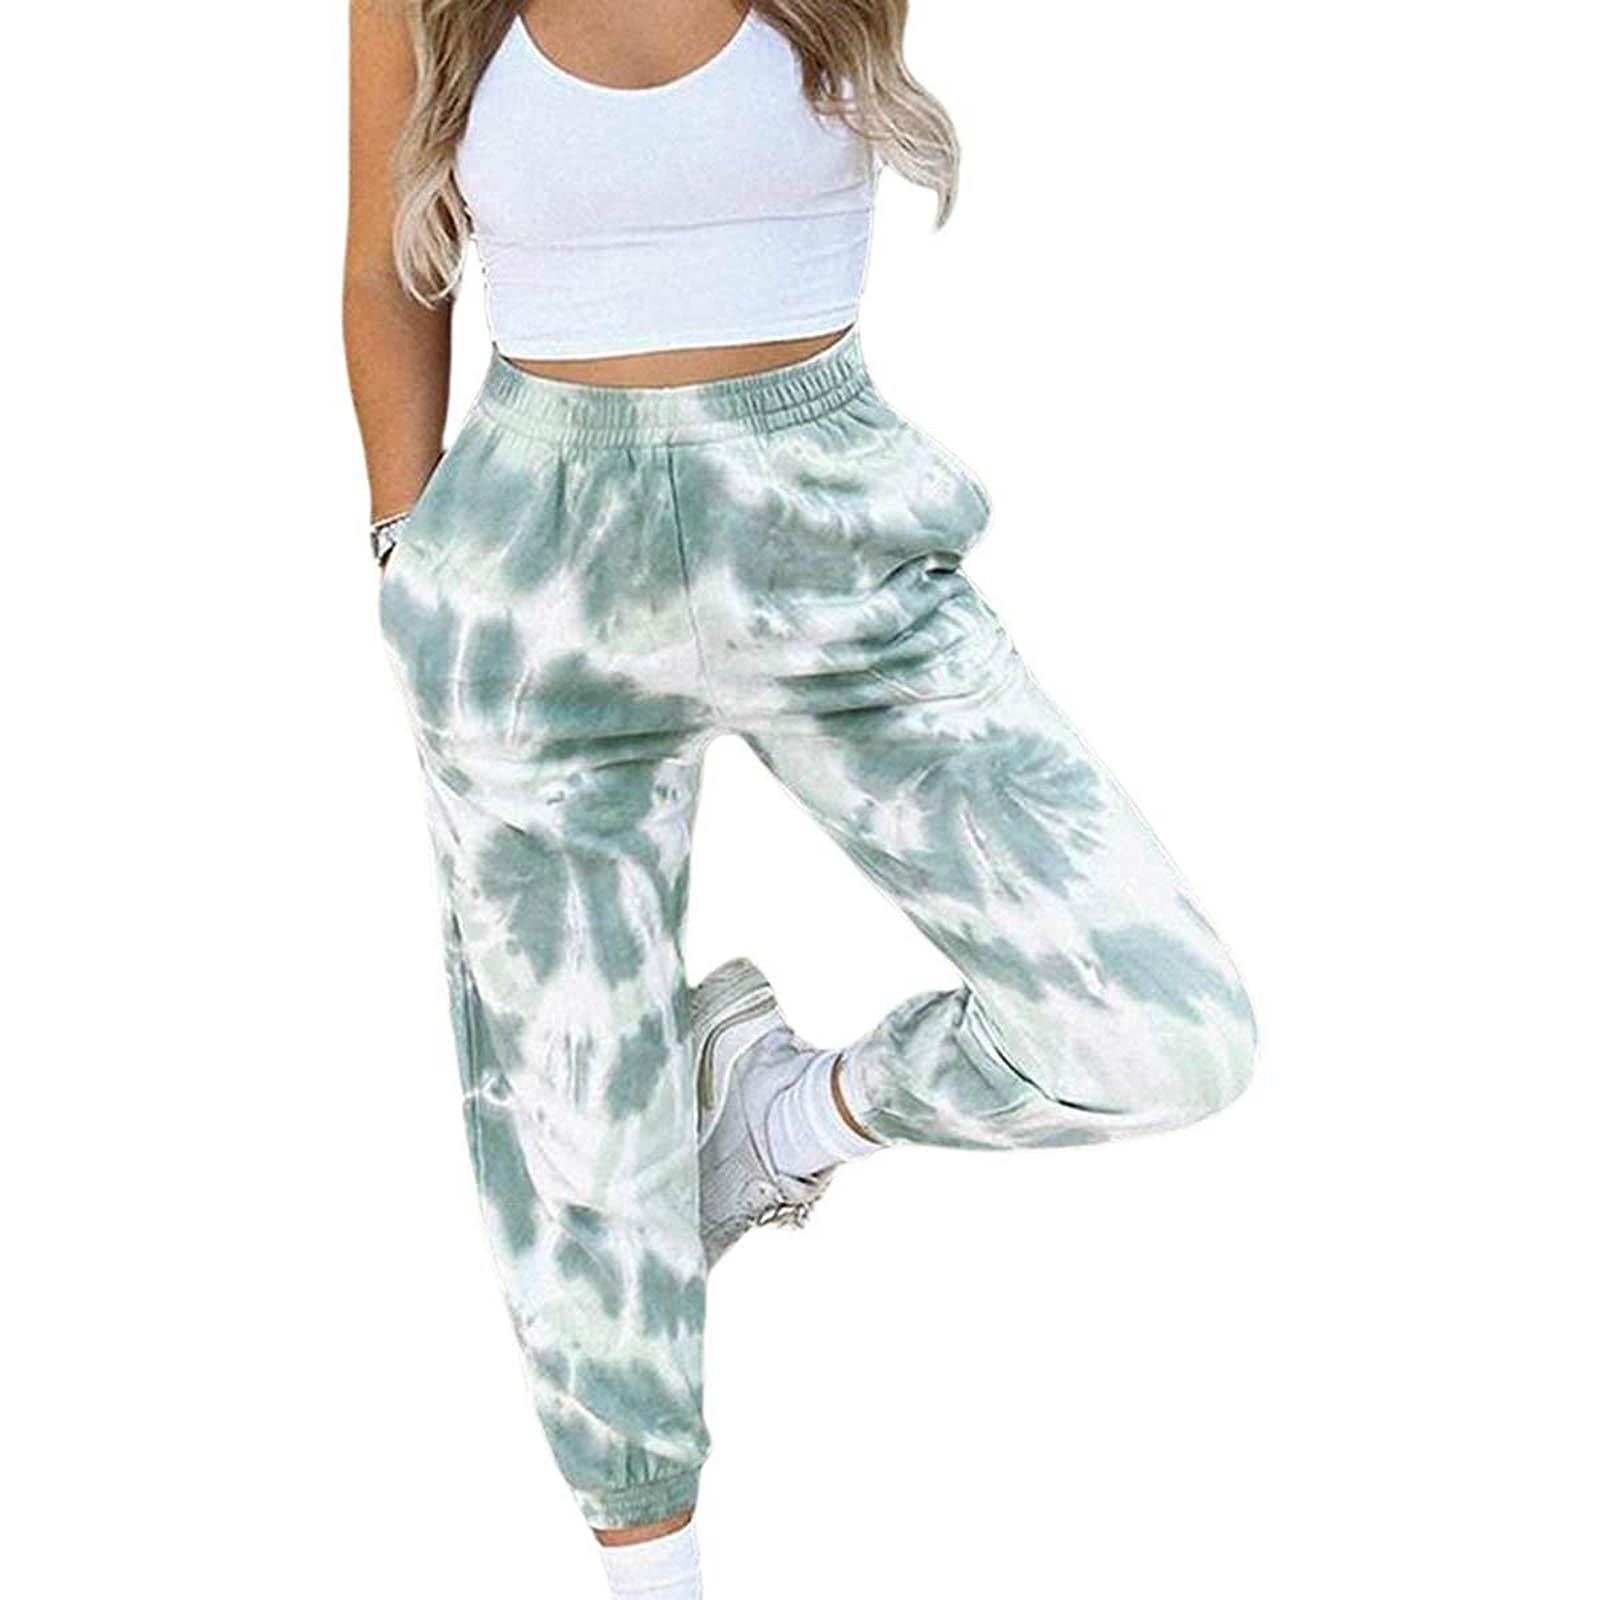 Fashion Tie Dye Sweatpants Women's High Waisted Sweatpants Joggers Trousers Pants Workout Sportswear